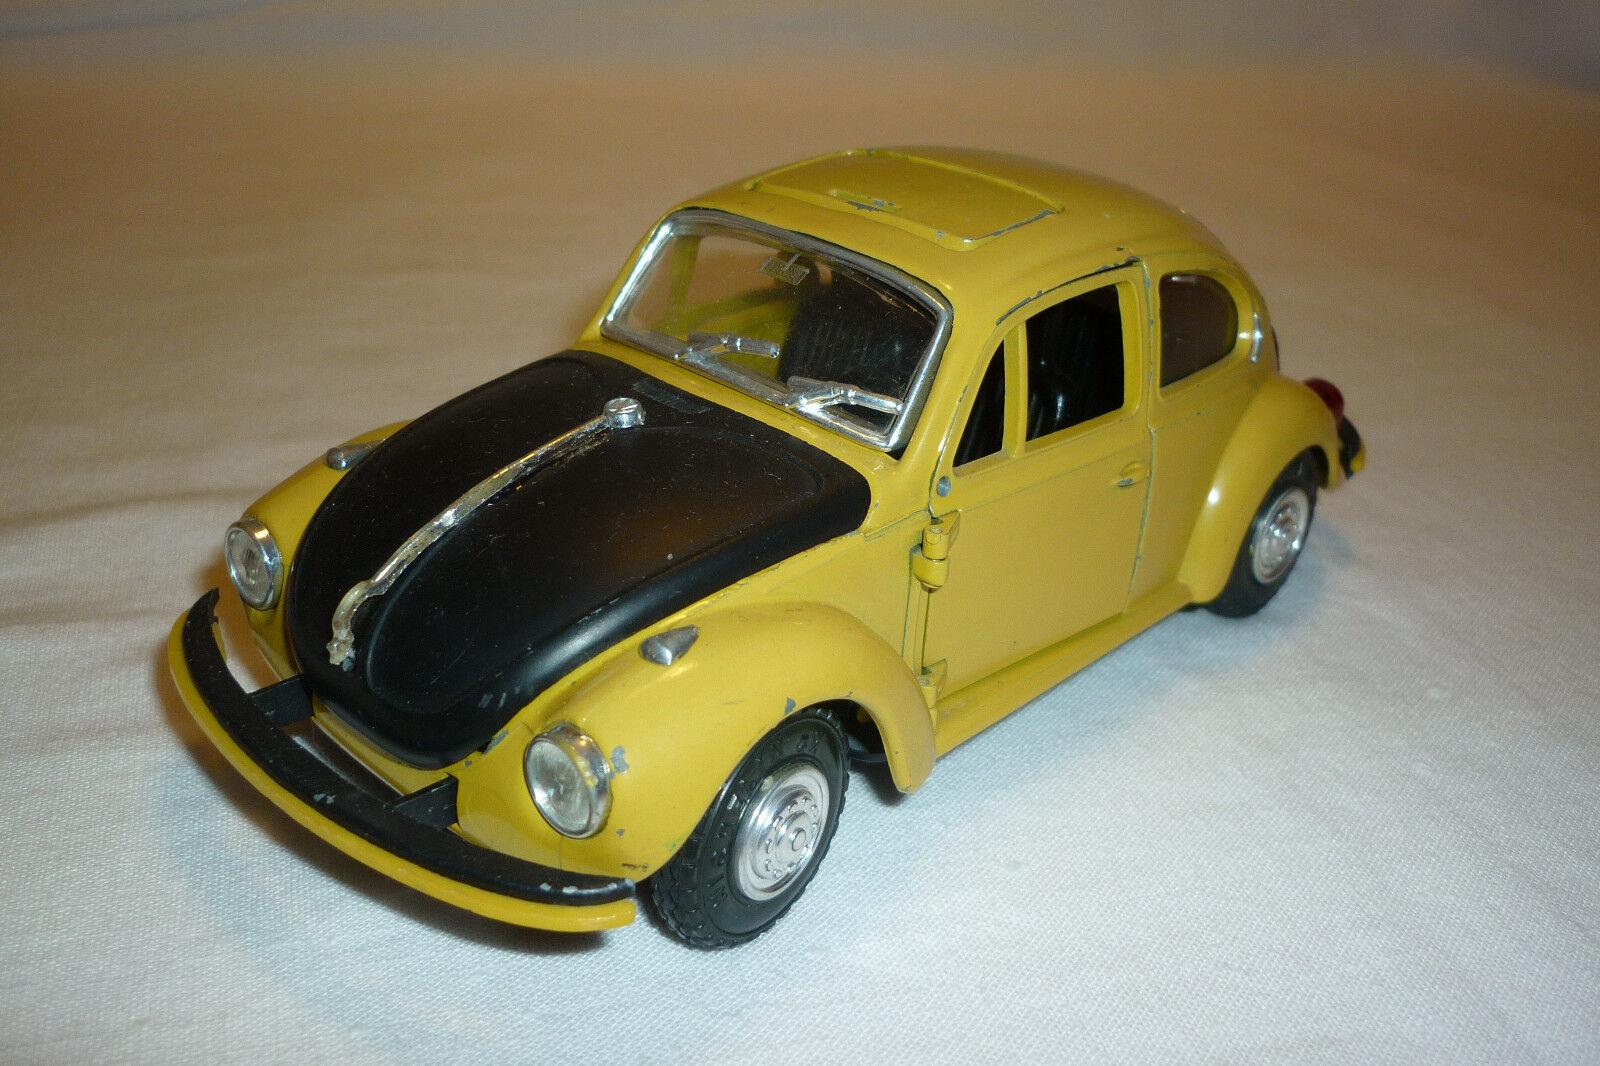 GAMA - VW 1302  - KÄFER - 1 24  - (1.MB-40)